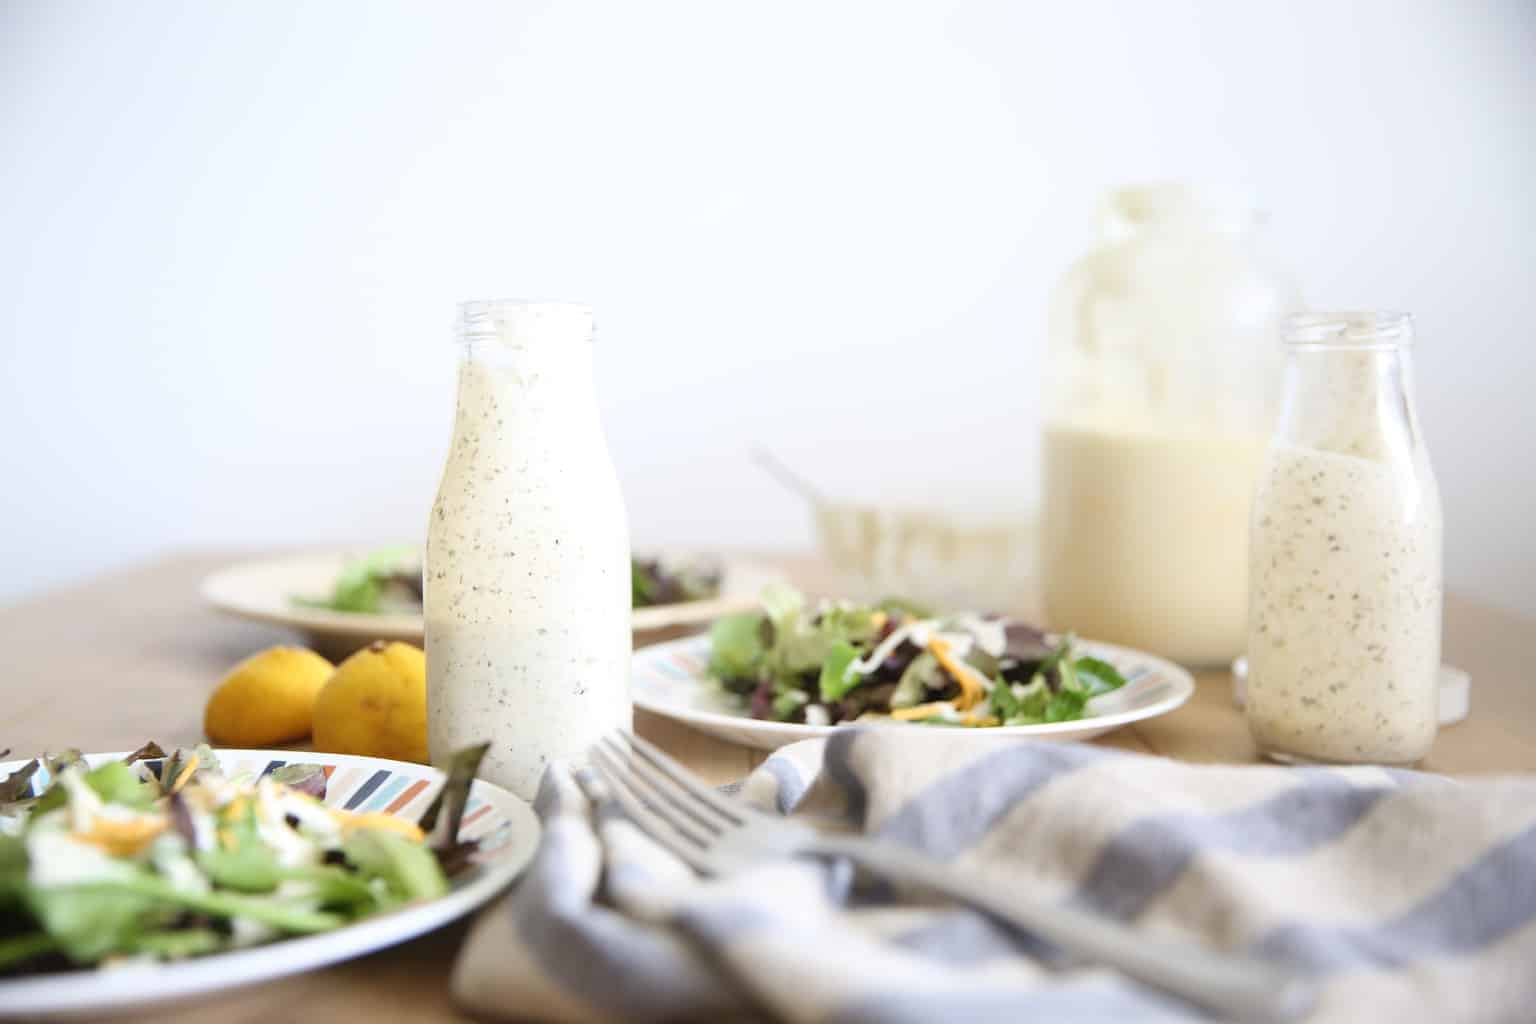 table set with salads and greek yogurt ranch dressing